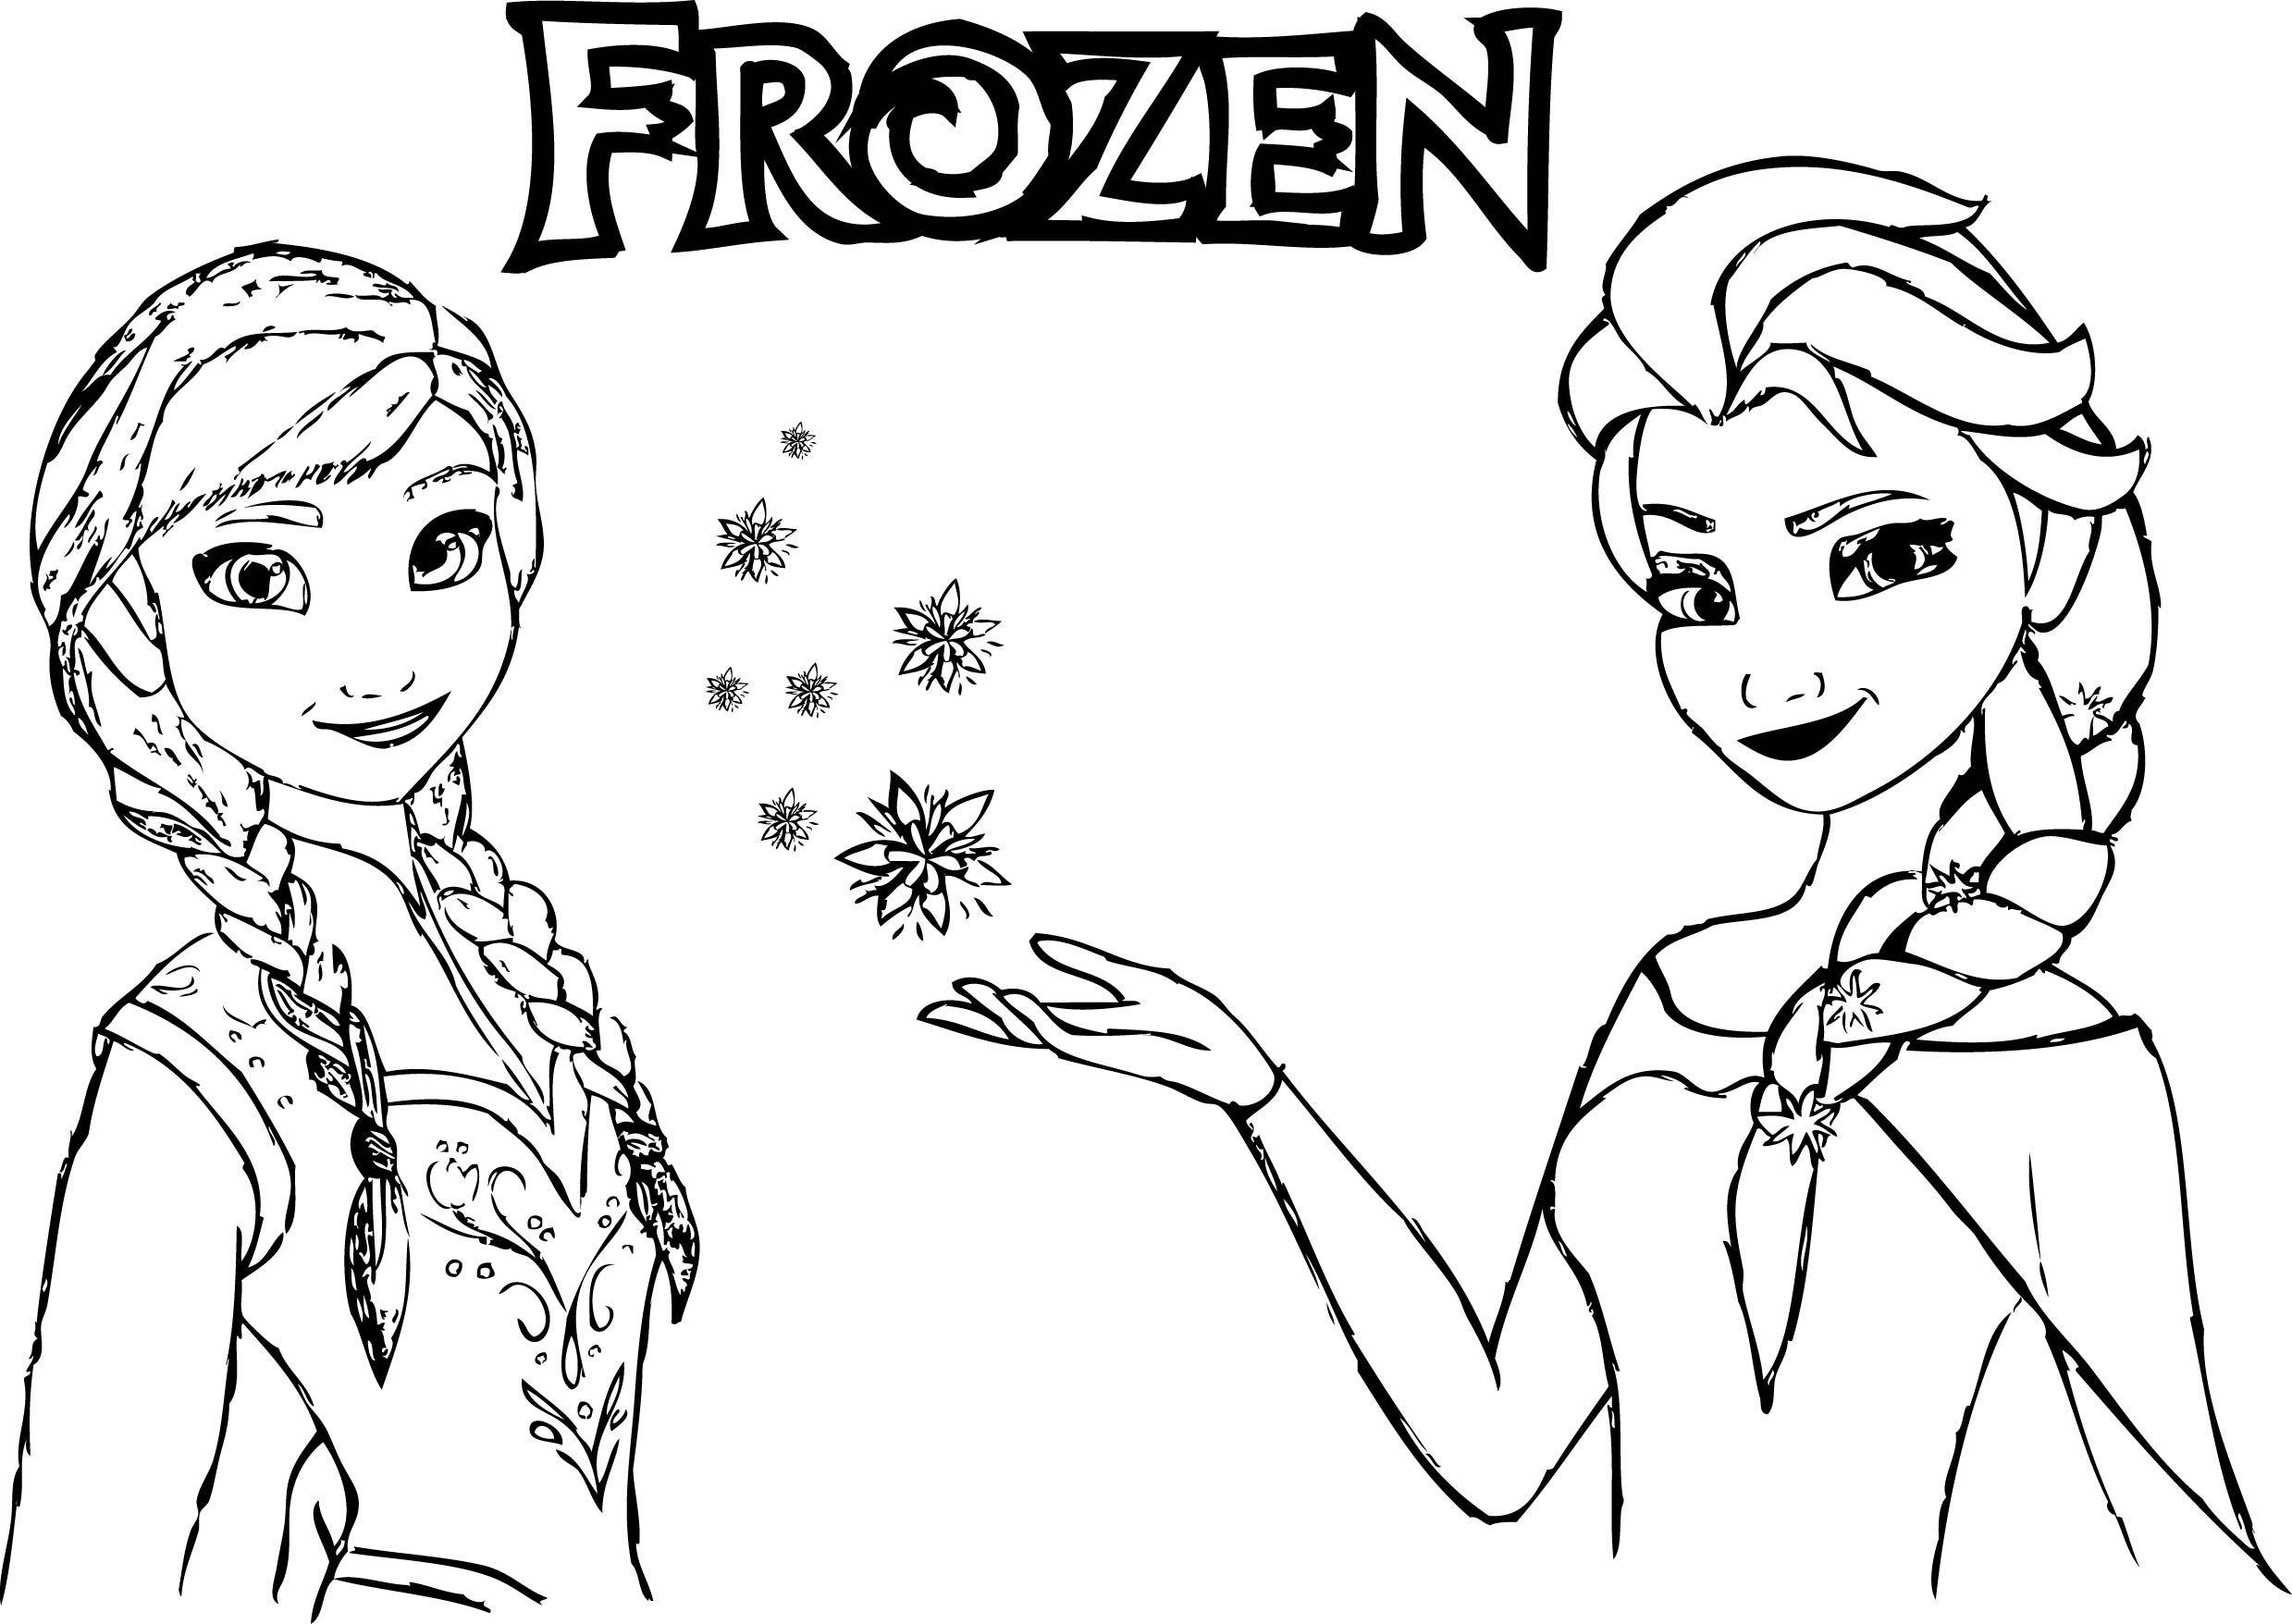 Frozen Anna Elsa Magic Coloring Page Wecoloringpage Pinterest